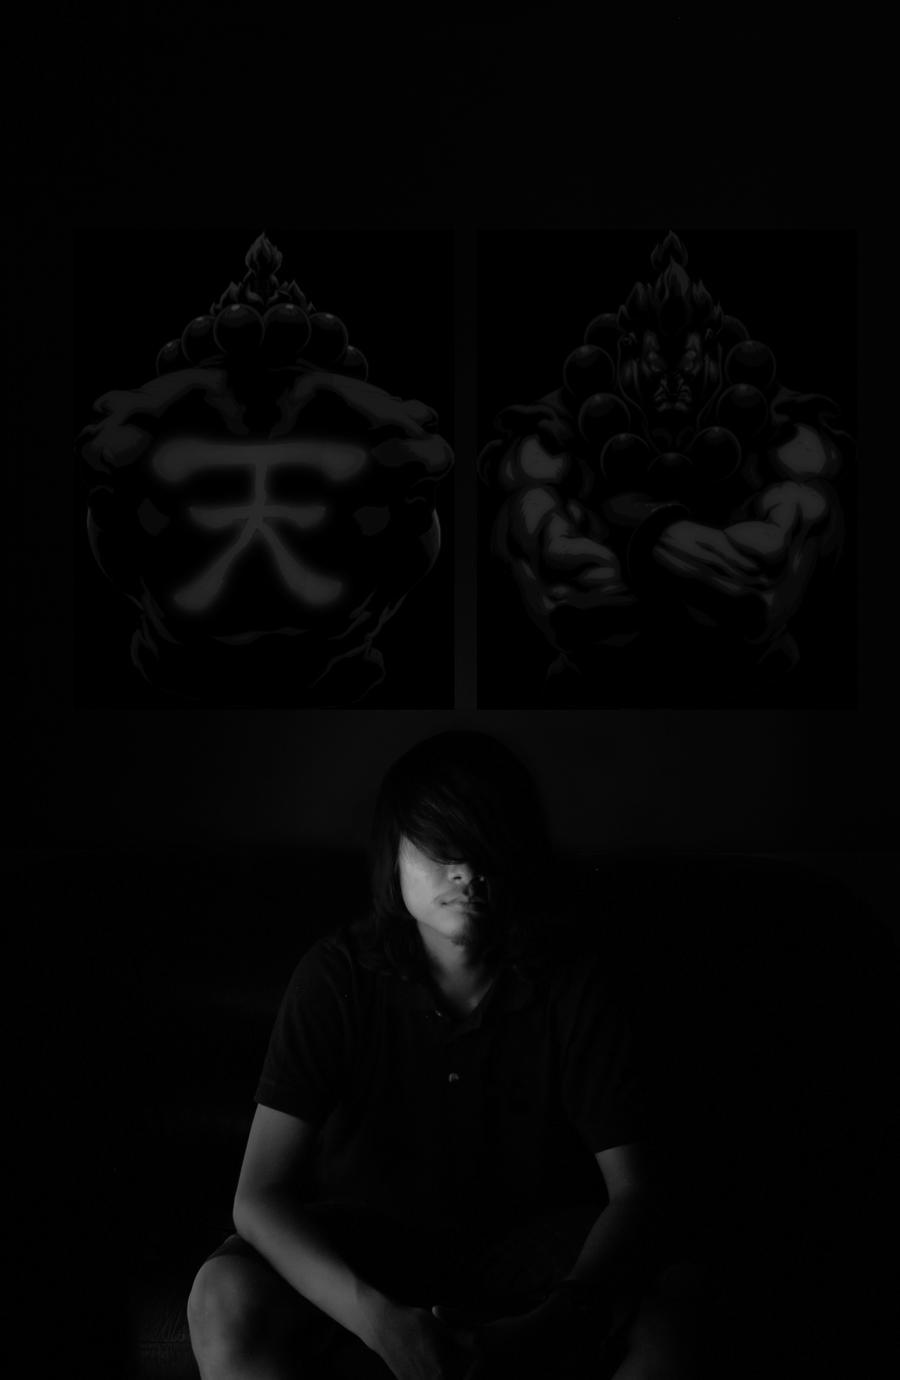 yamakato's Profile Picture